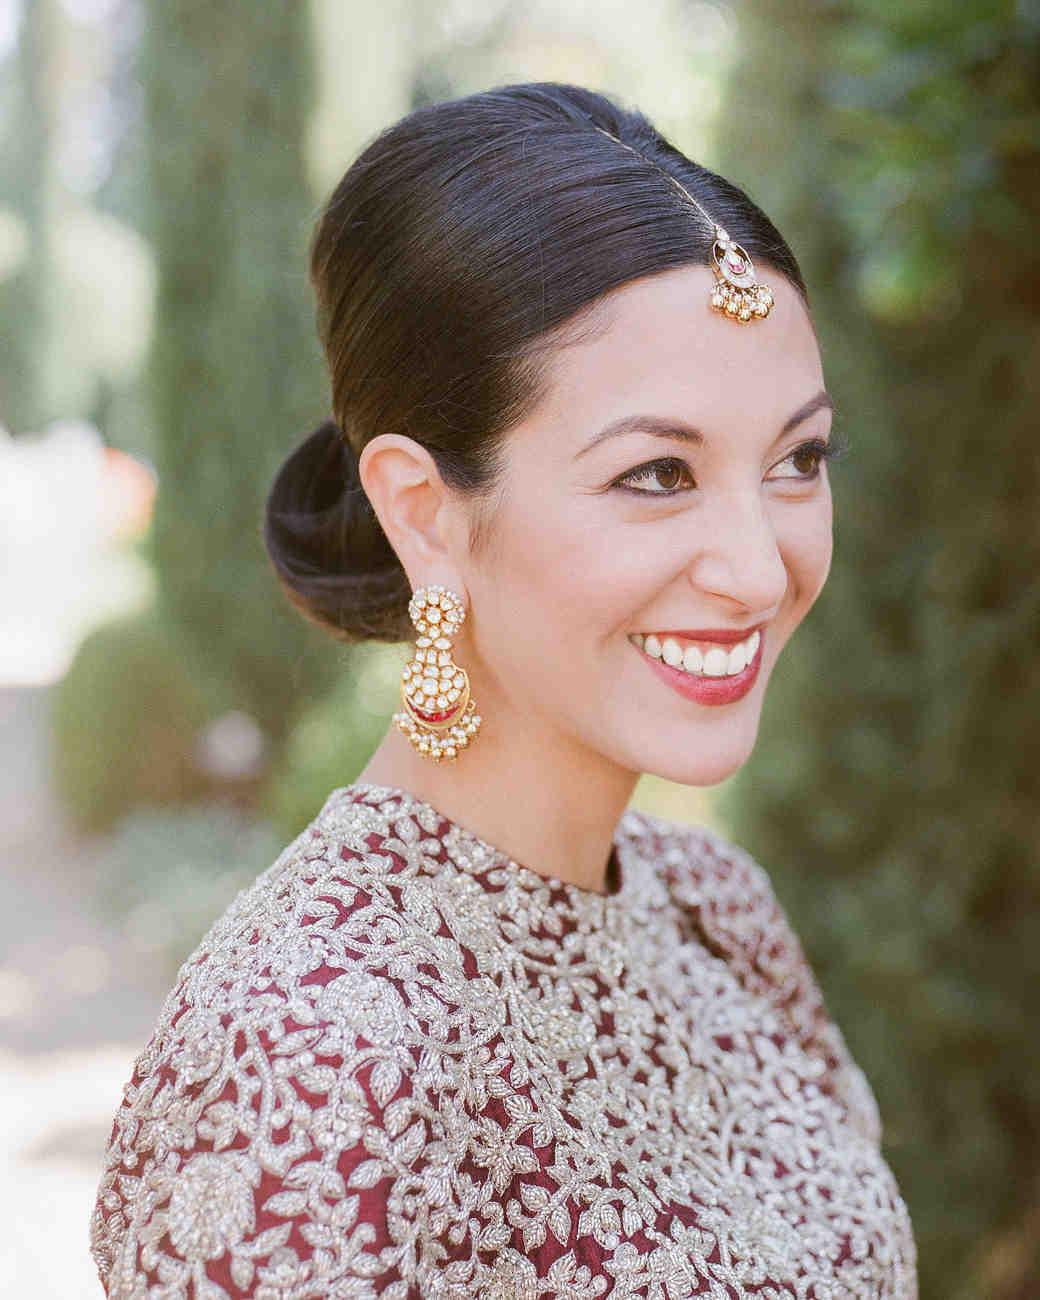 jenna alok wedding wine country california bride smiling